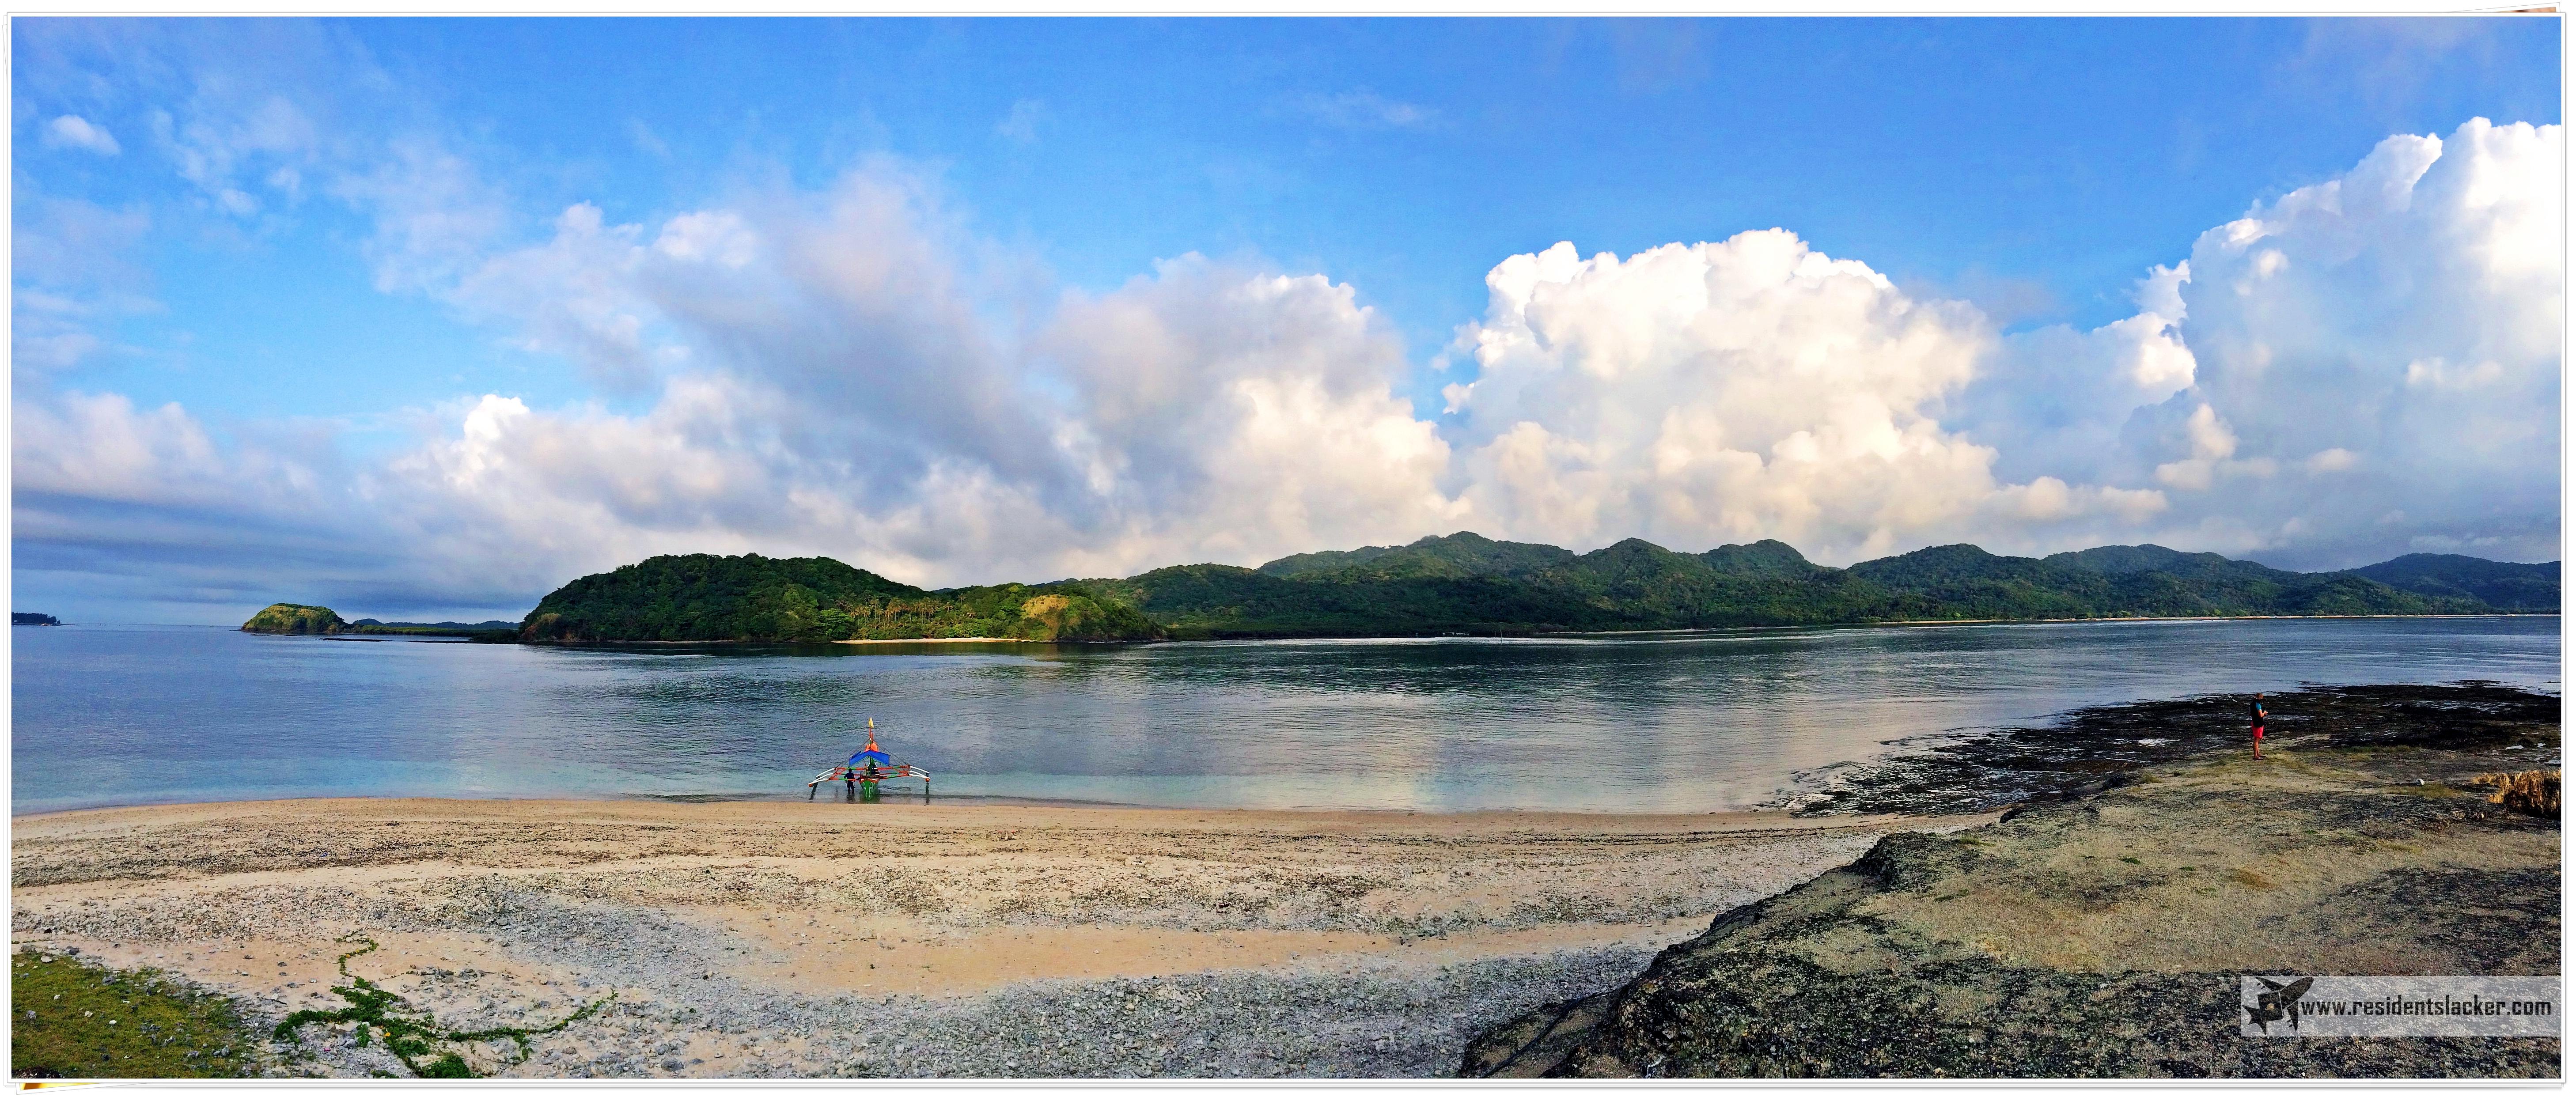 Crocodile Island, Cagayan Valley, PH - 2015